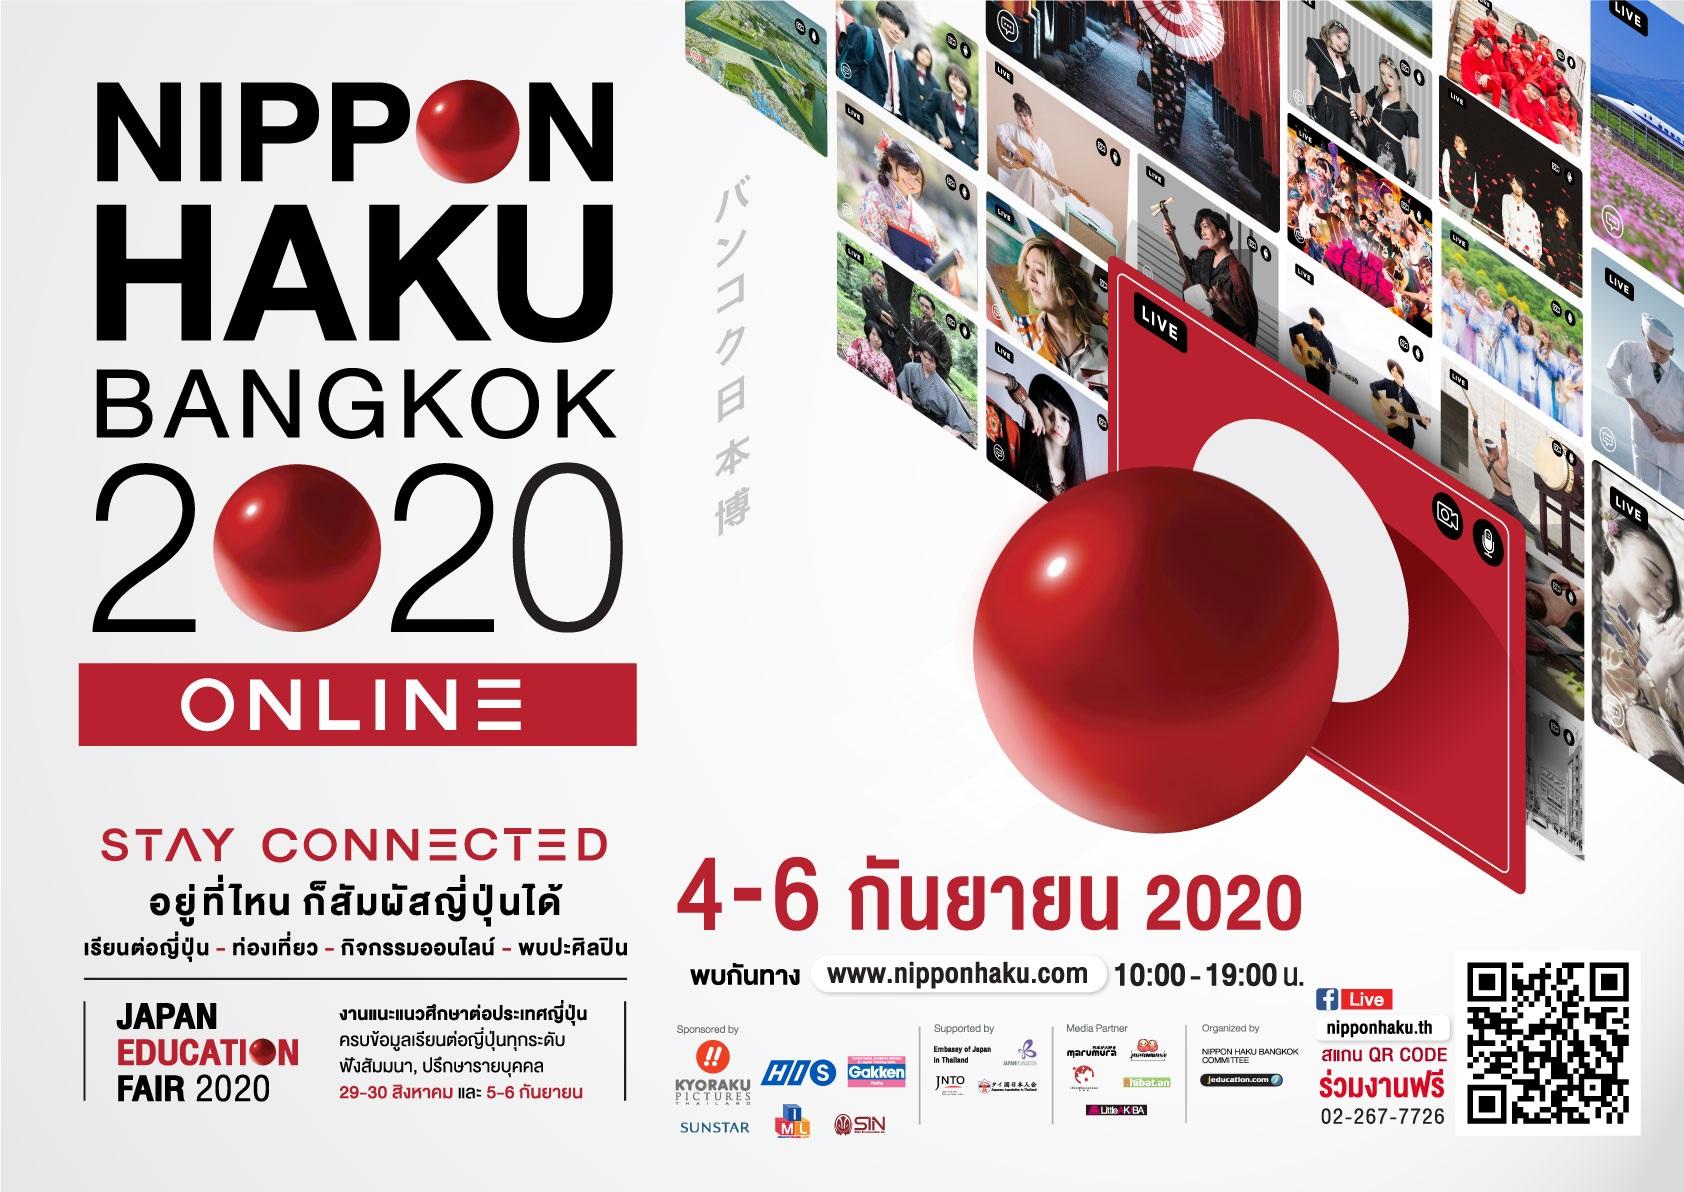 nipponhaku NIPPONHAKUBANGKOK2020 StayConnected นิปปอนฮาคุ